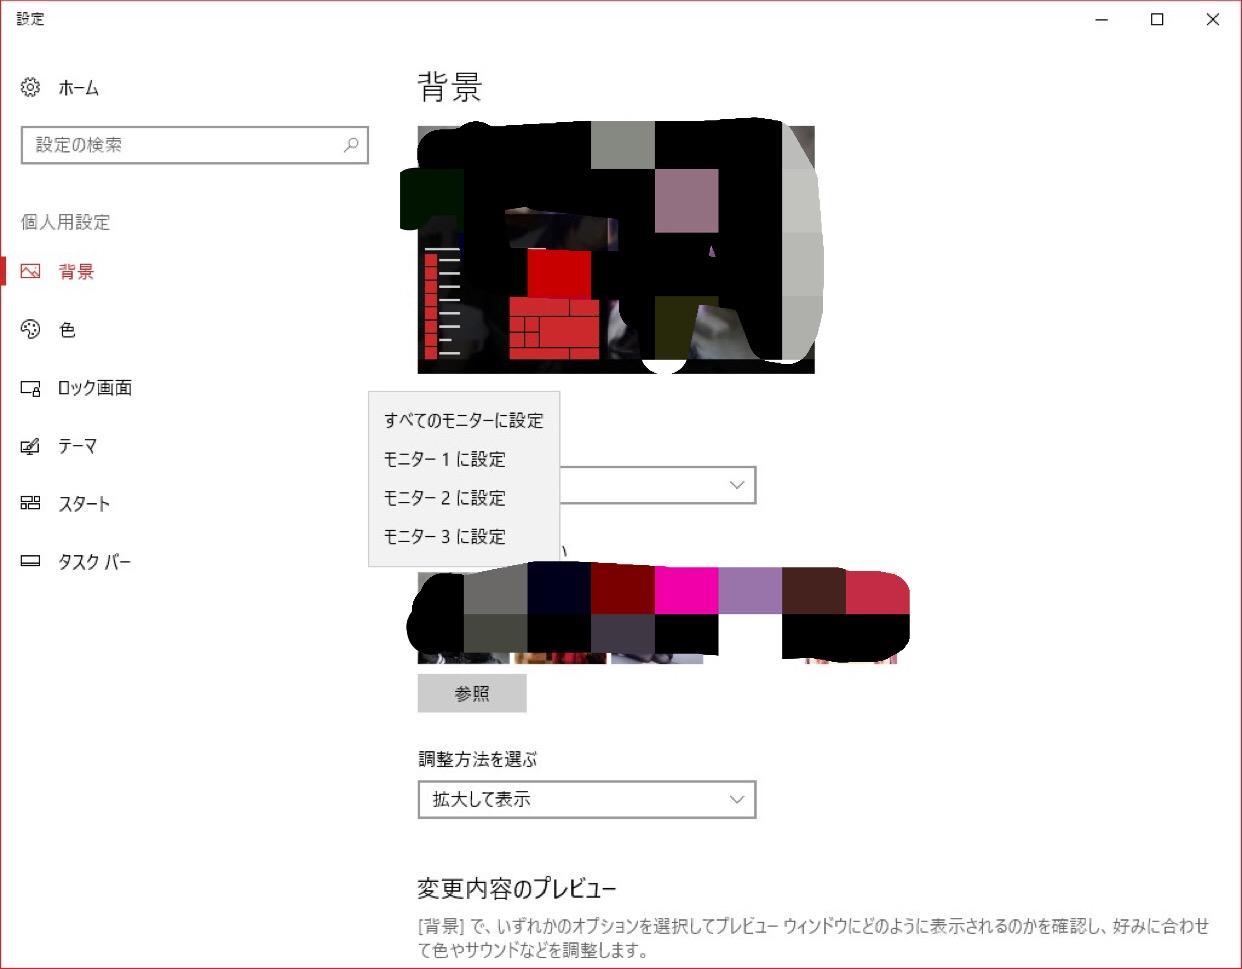 https://konozama.jp/amazon_devil/image1.jpeg